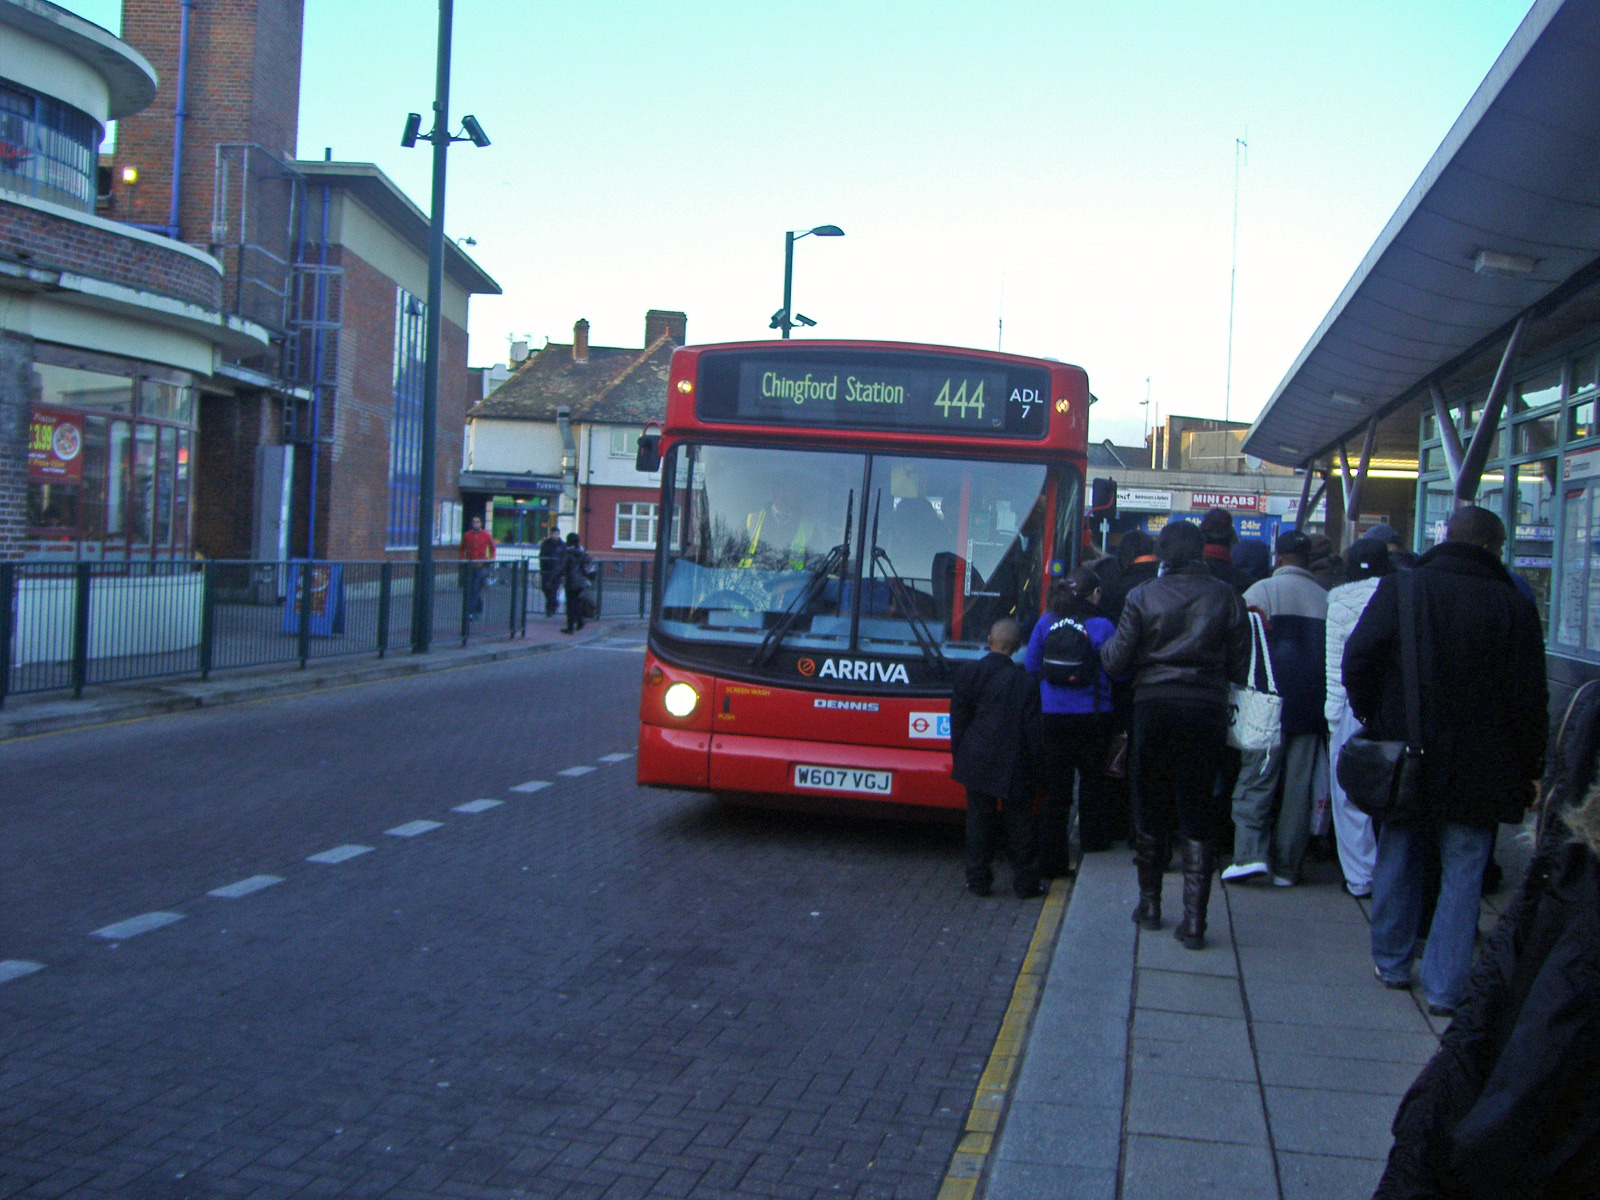 file london buses route 444 turnpike lane. Black Bedroom Furniture Sets. Home Design Ideas